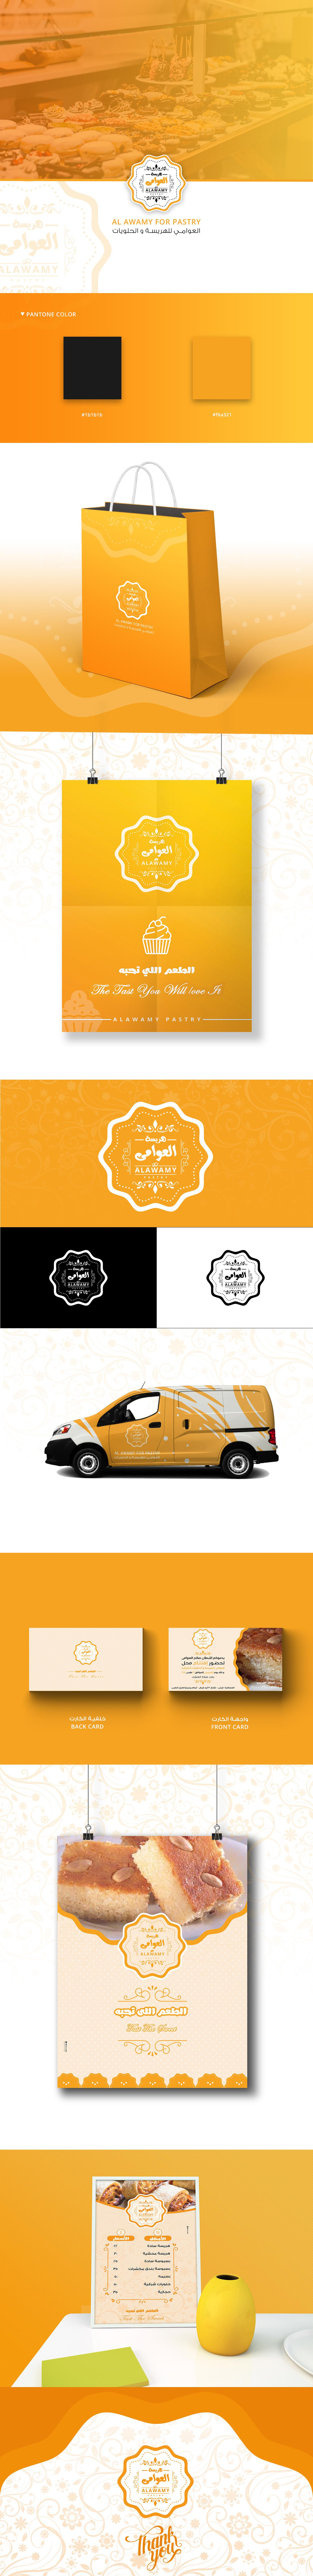 pastry,shop,graphic design ,identity,Corporate Identity,logo,flyer,design